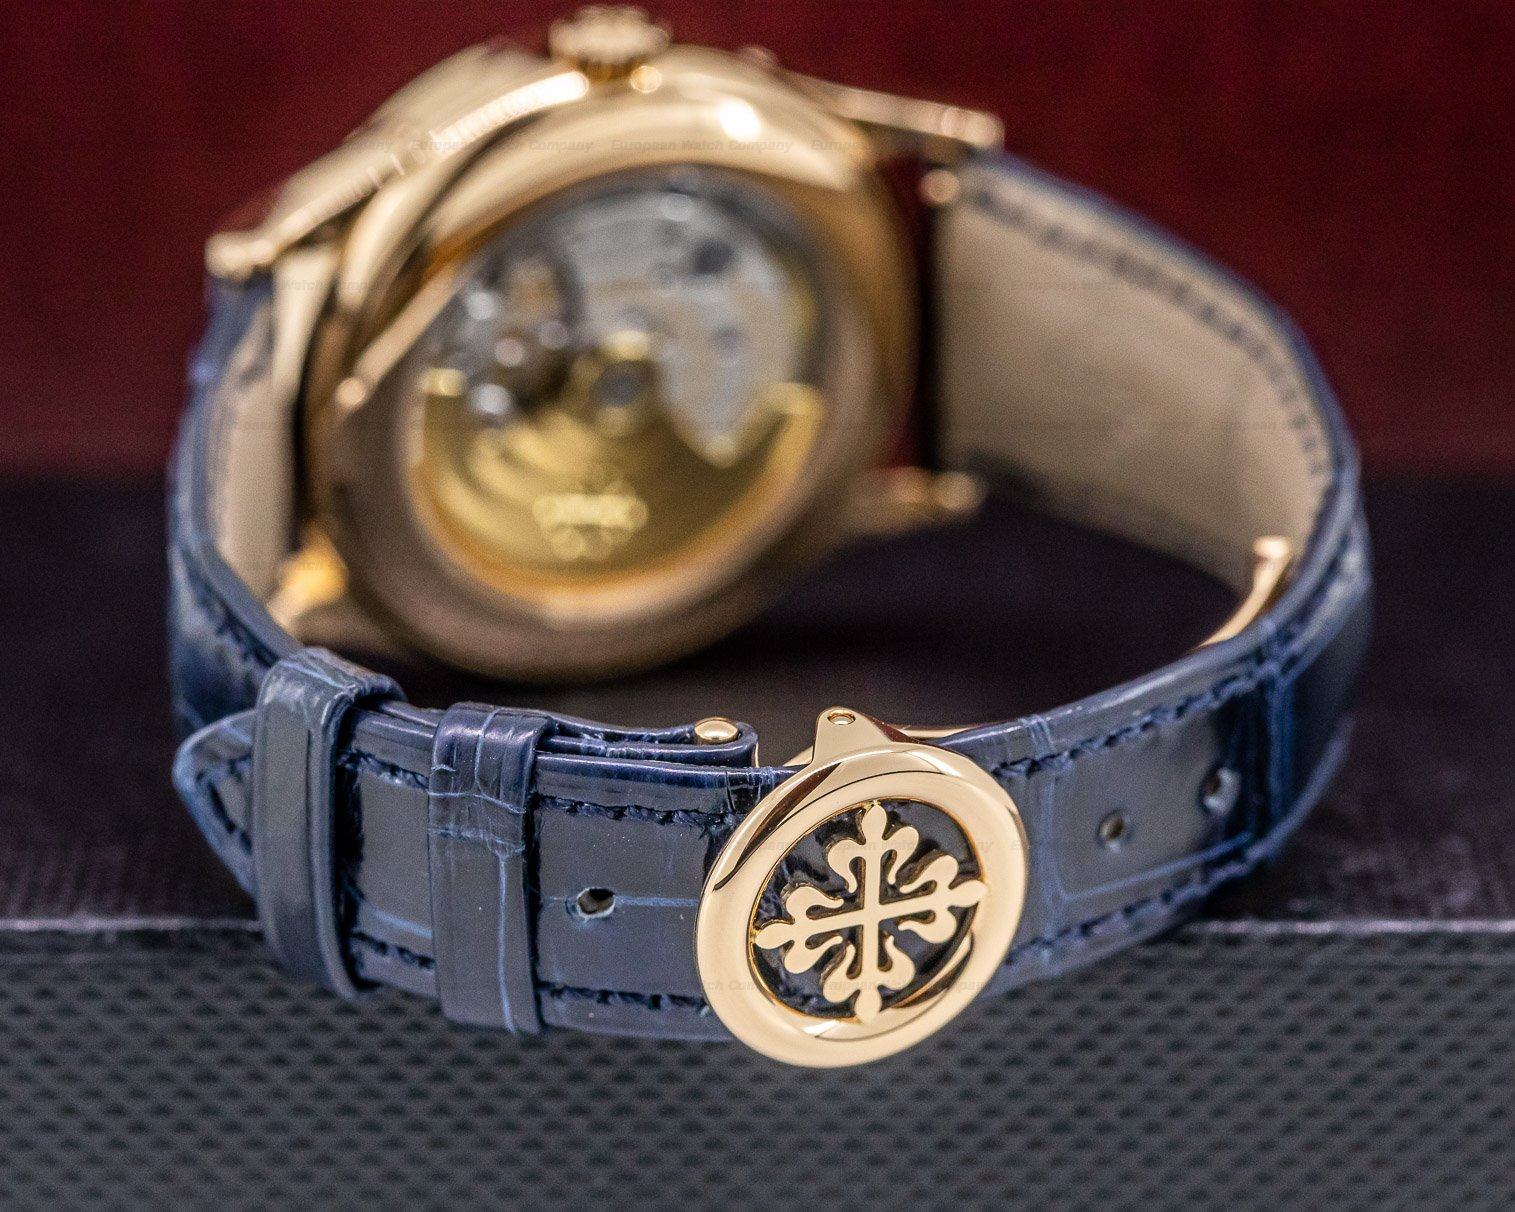 Patek Philippe 5396R-014 Annual Calendar Rose Gold Blue Dial